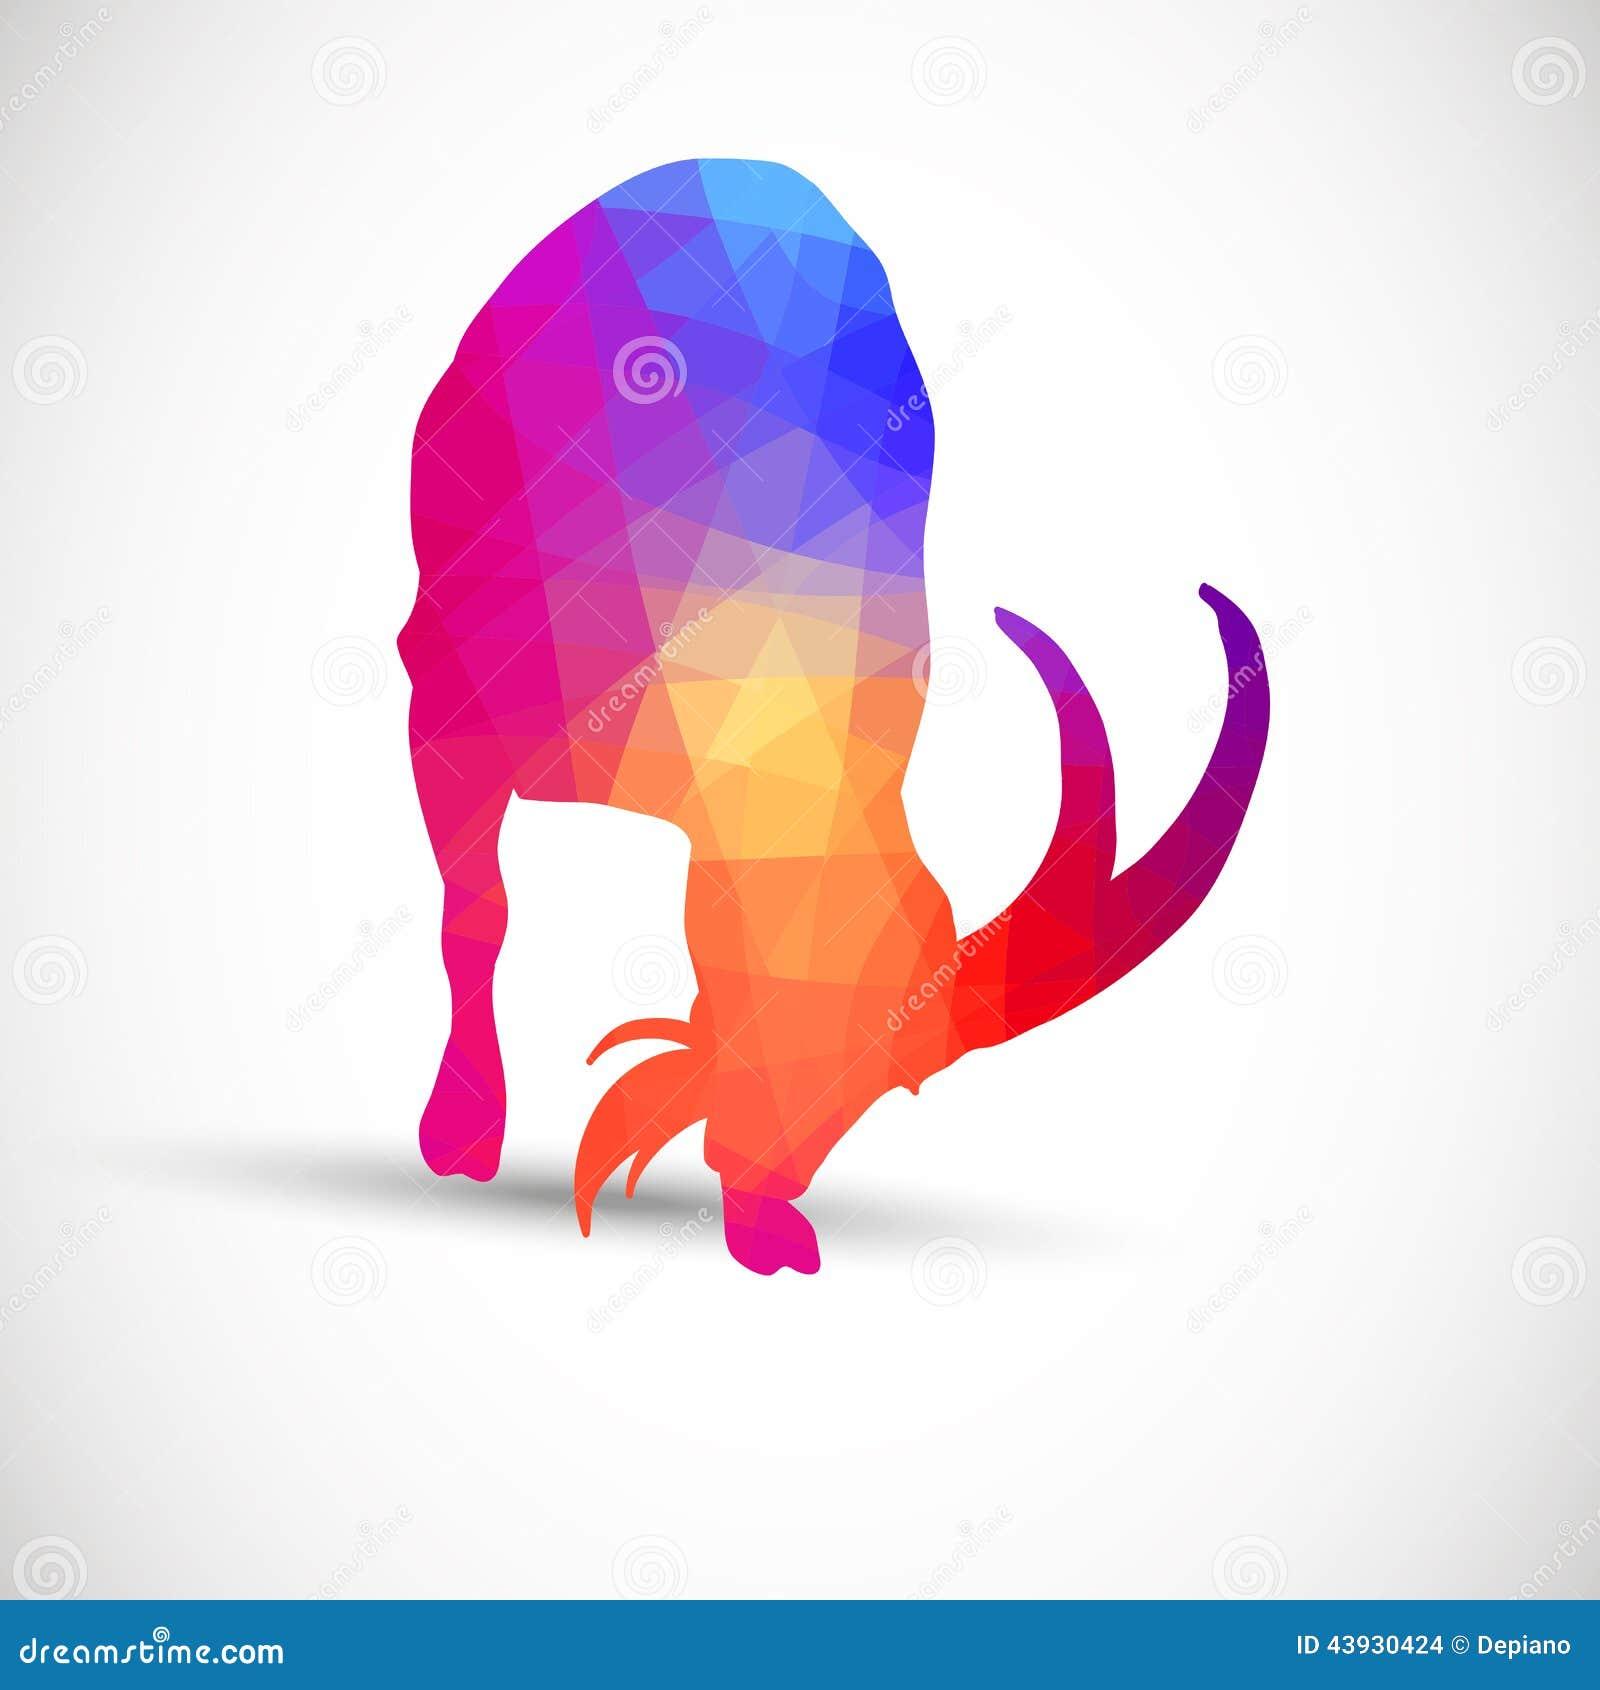 simple animal silhouettes